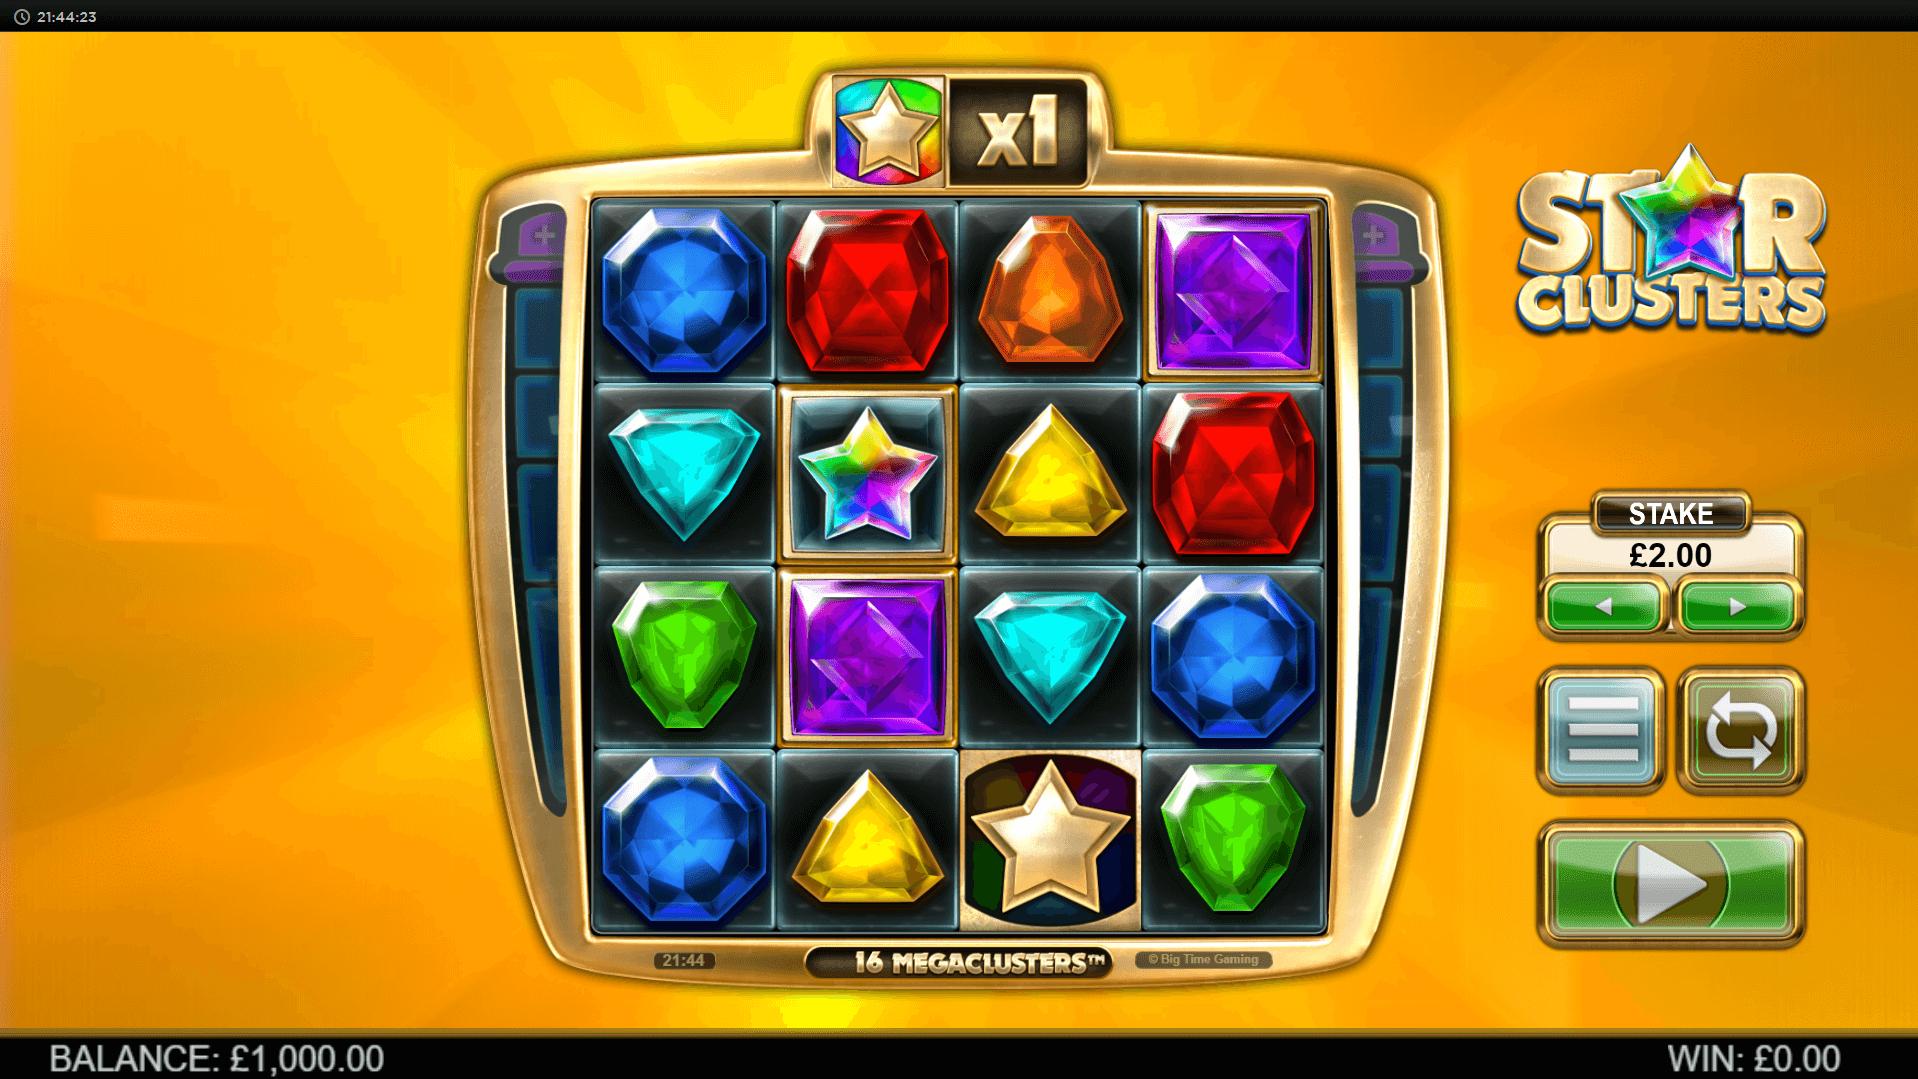 Star Clusters Megaclusters slot machine screenshot